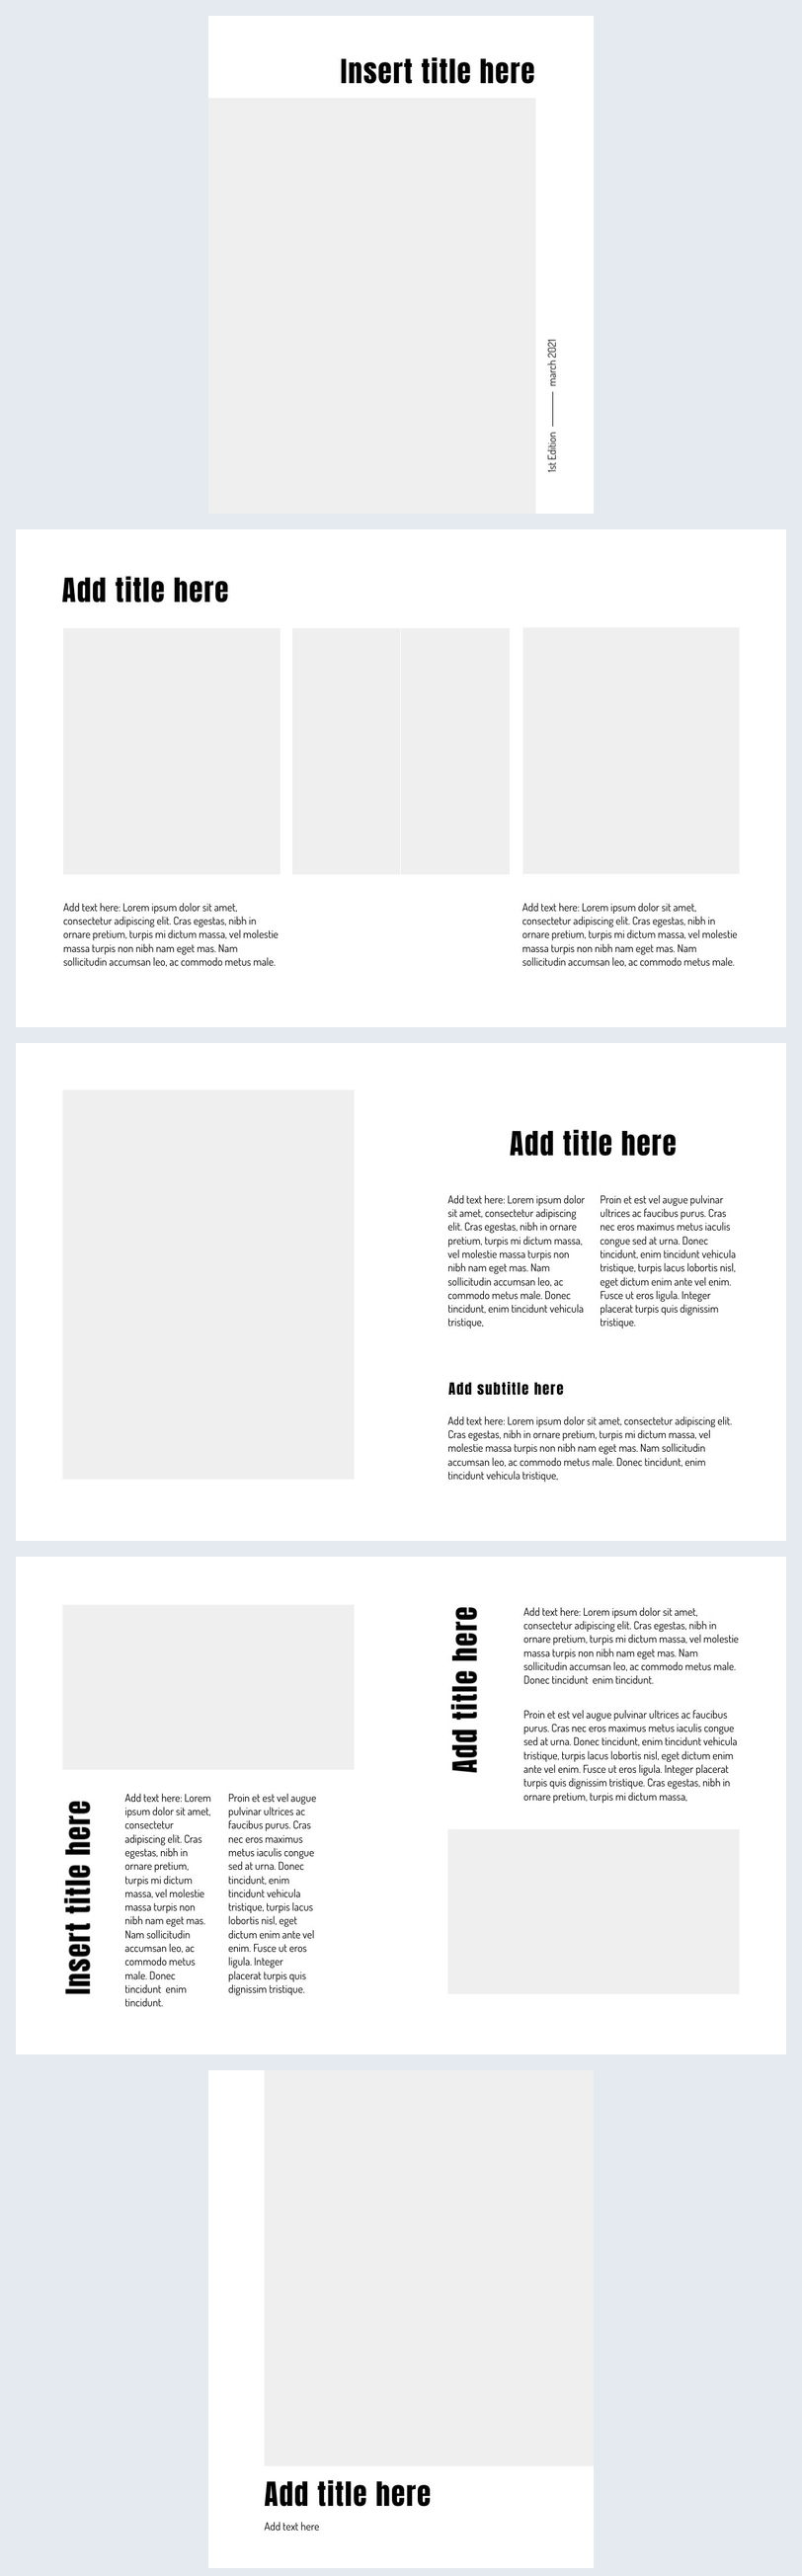 Free Online Blank Flip Book Design Example